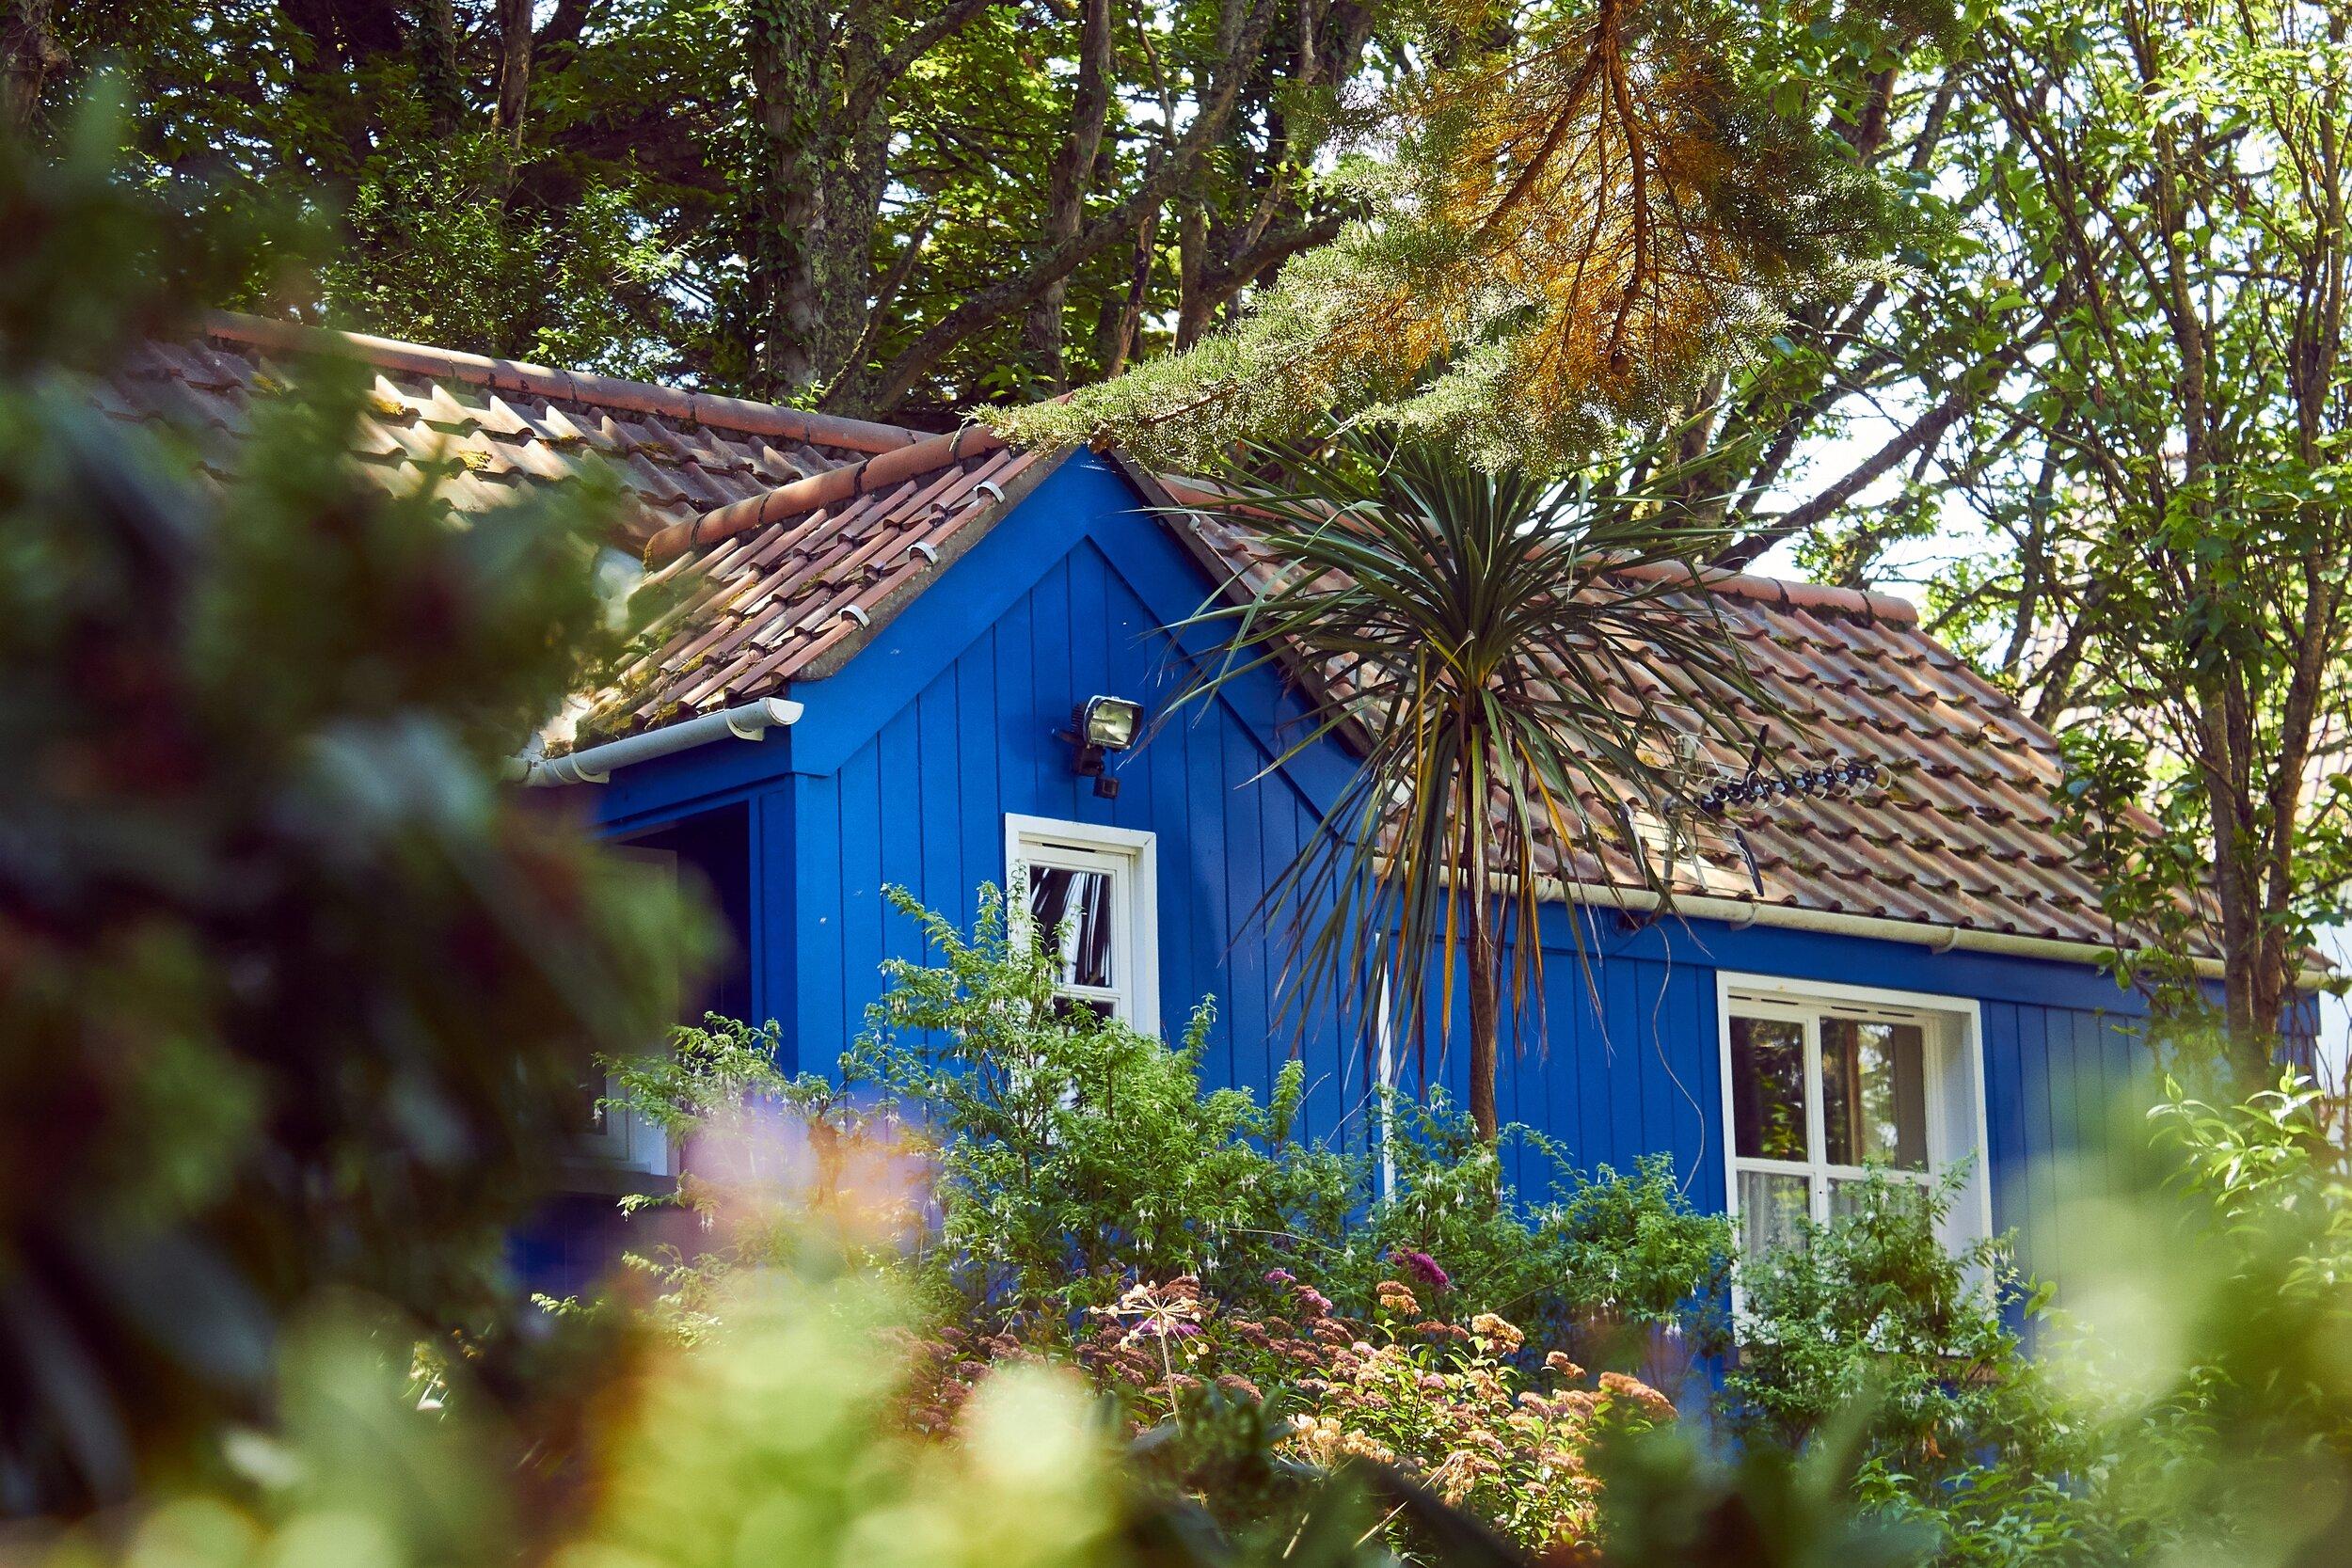 architecture-blur-bungalow-2825030.jpg